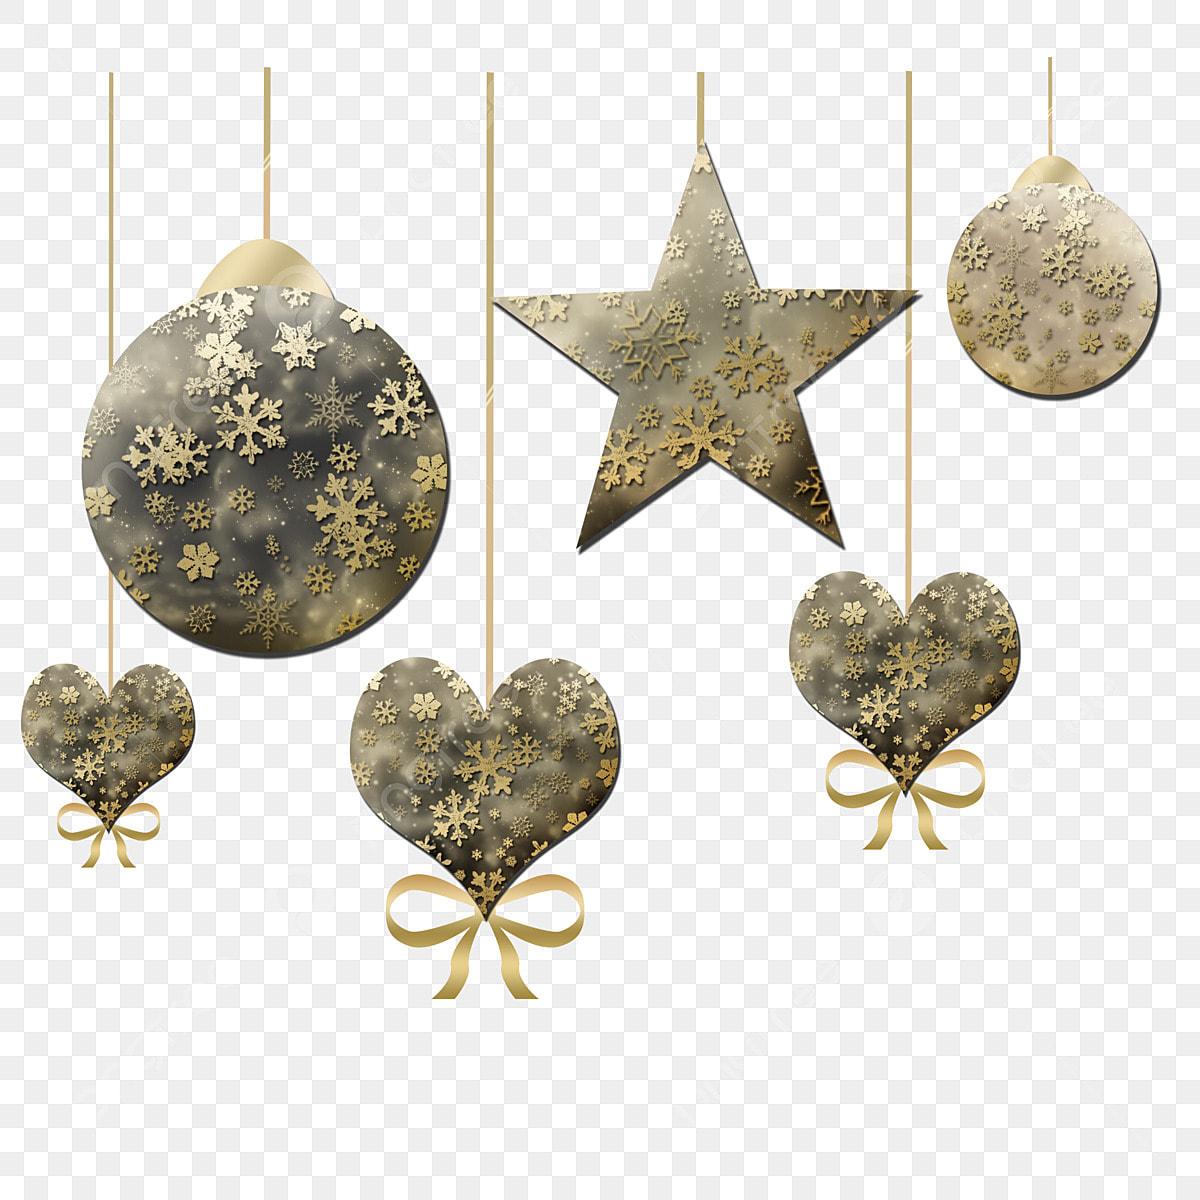 Gold Christmas Ornaments Png.Christmas Christmas Night Ornaments Black Gold Ornaments